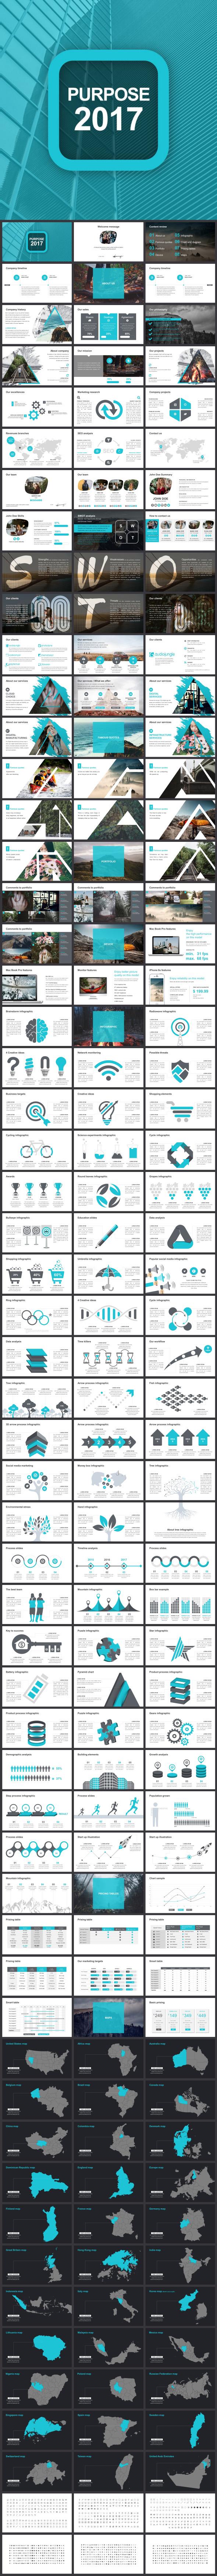 Purpose 2017 Google Slides Template - Google Slides Presentation Templates